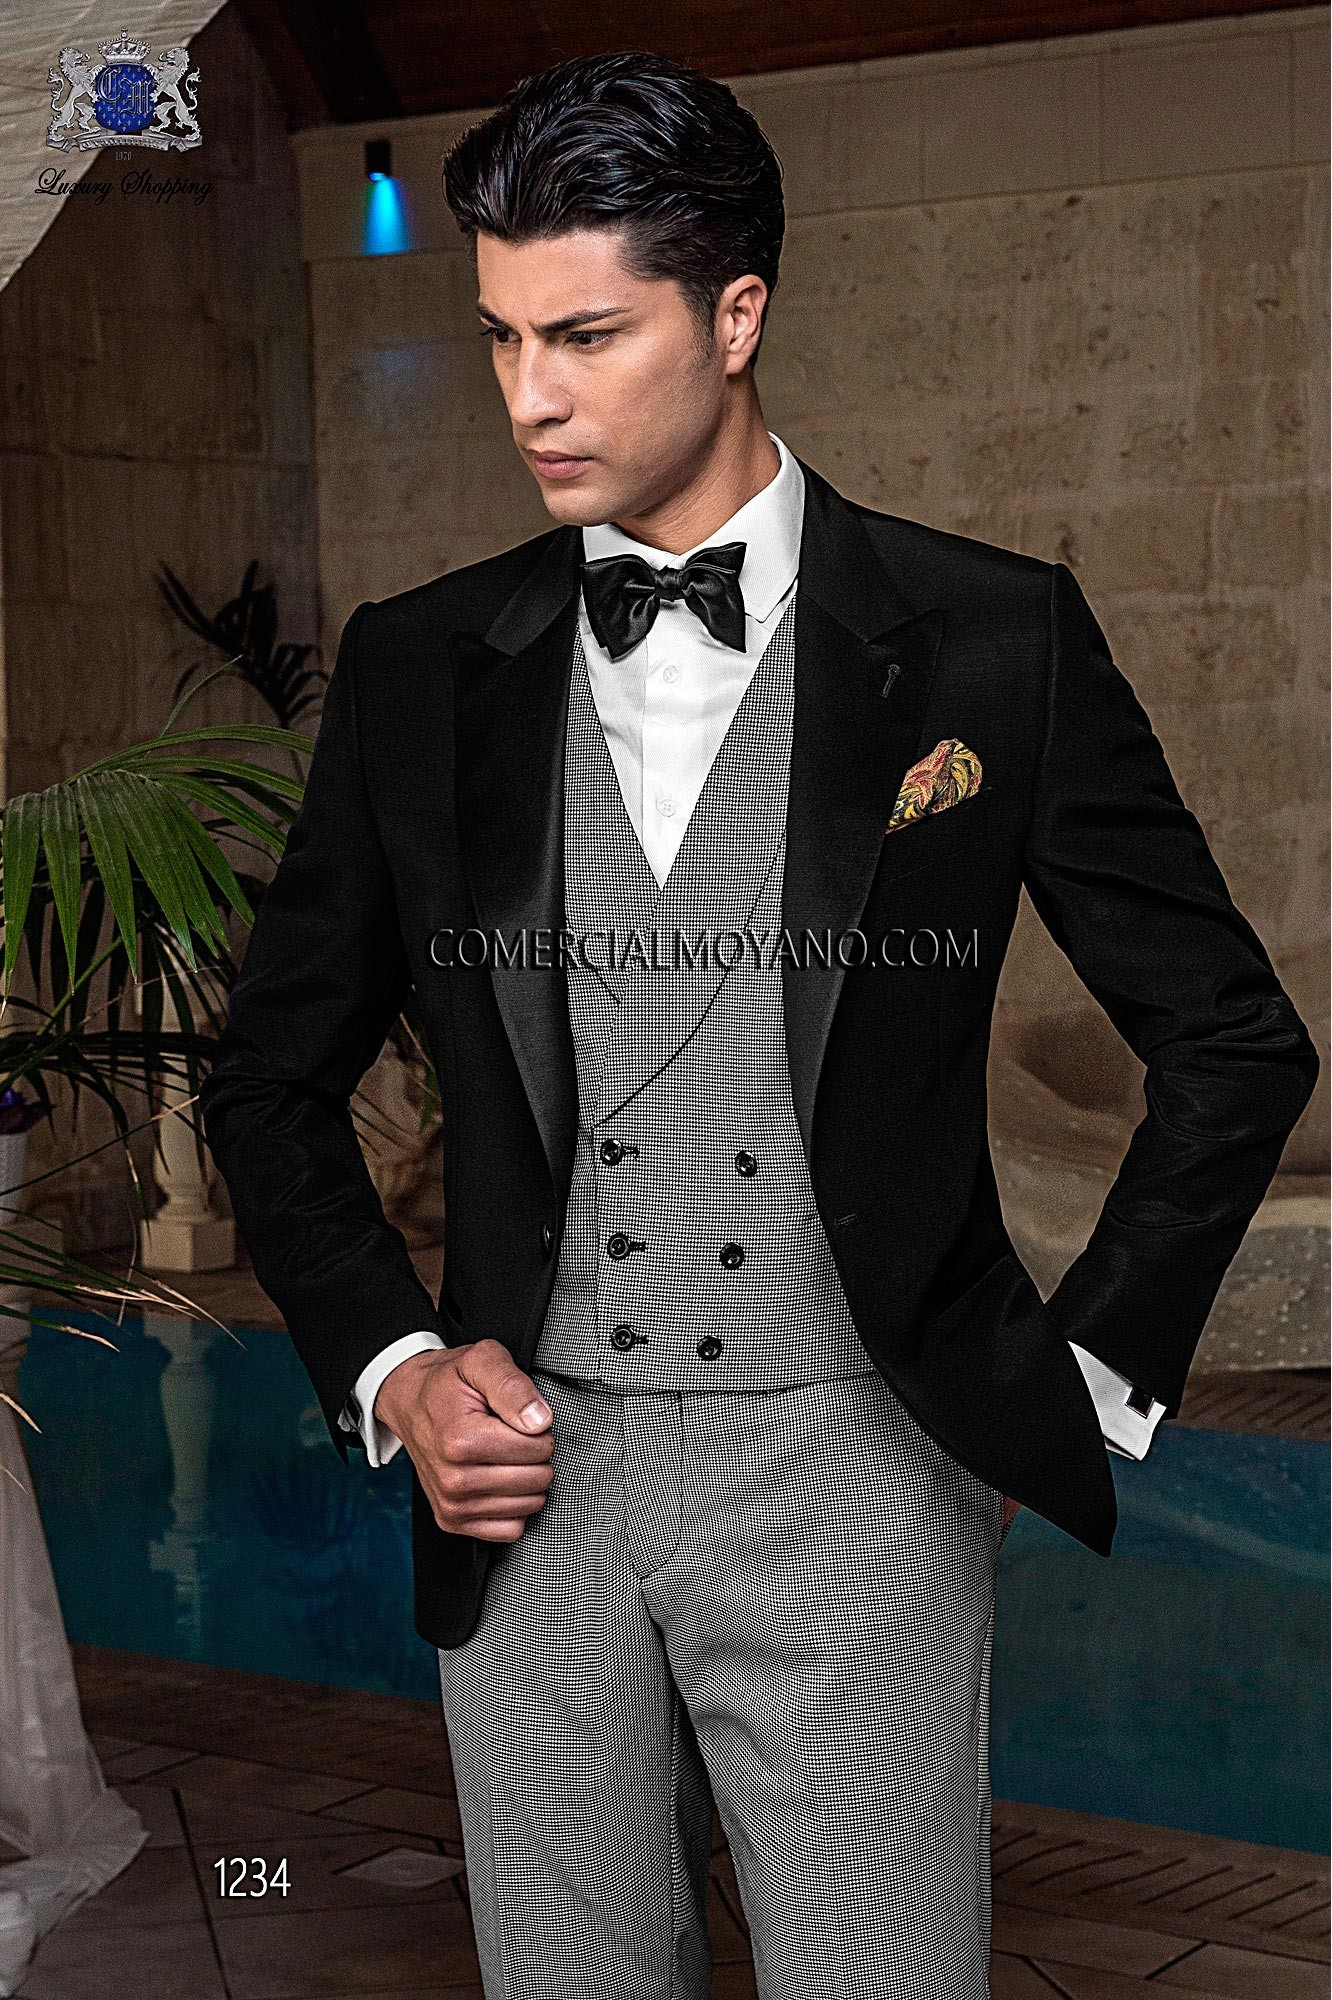 Black Tie black men wedding suit model 1234 Ottavio Nuccio Gala